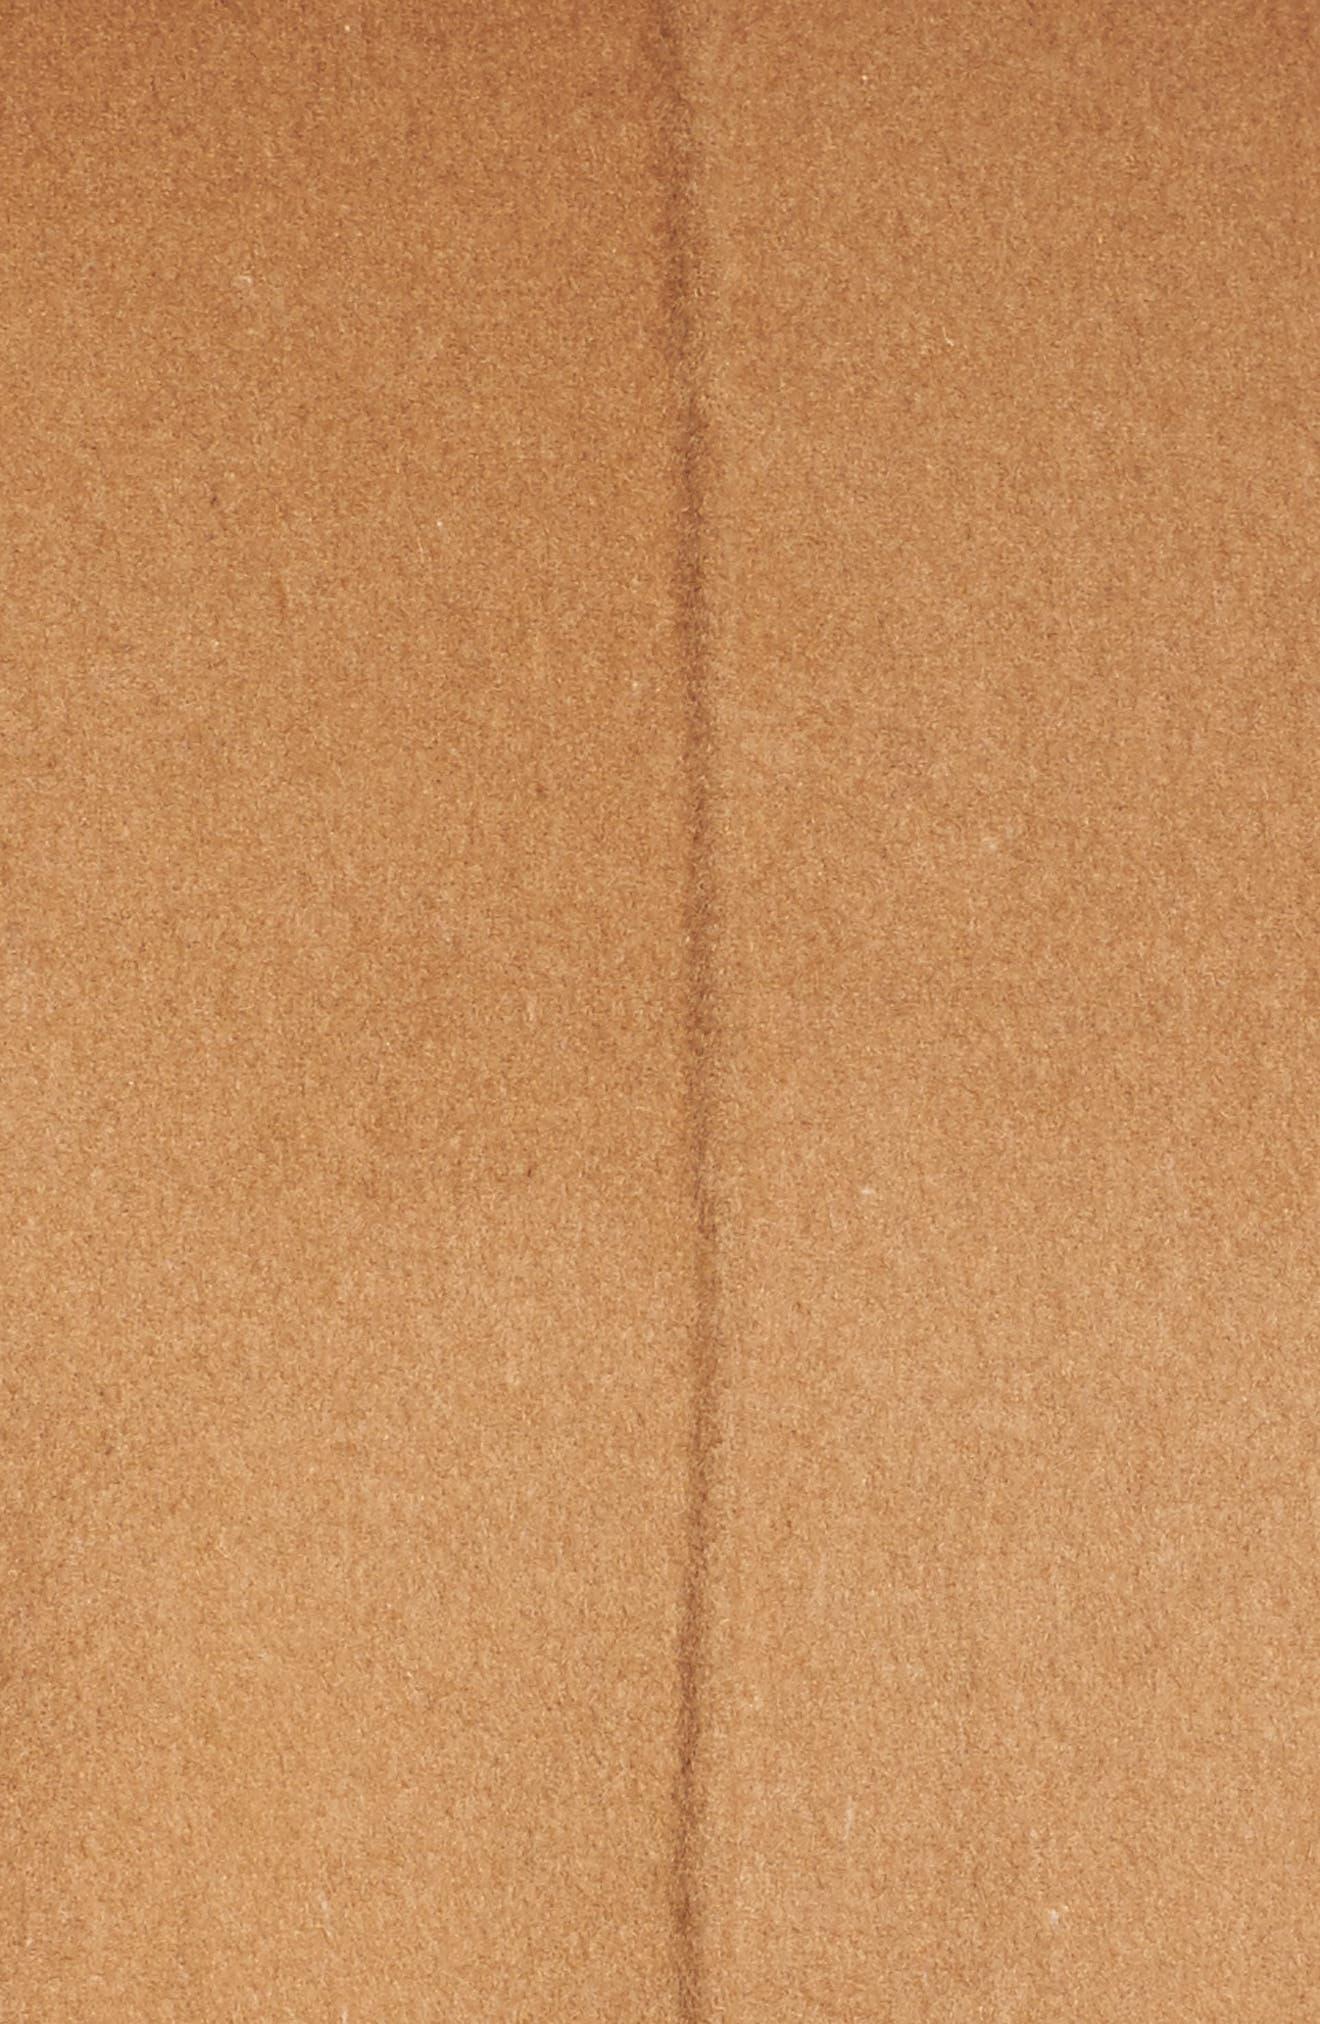 Nina Double Face Wool Blend Coat,                             Alternate thumbnail 6, color,                             214